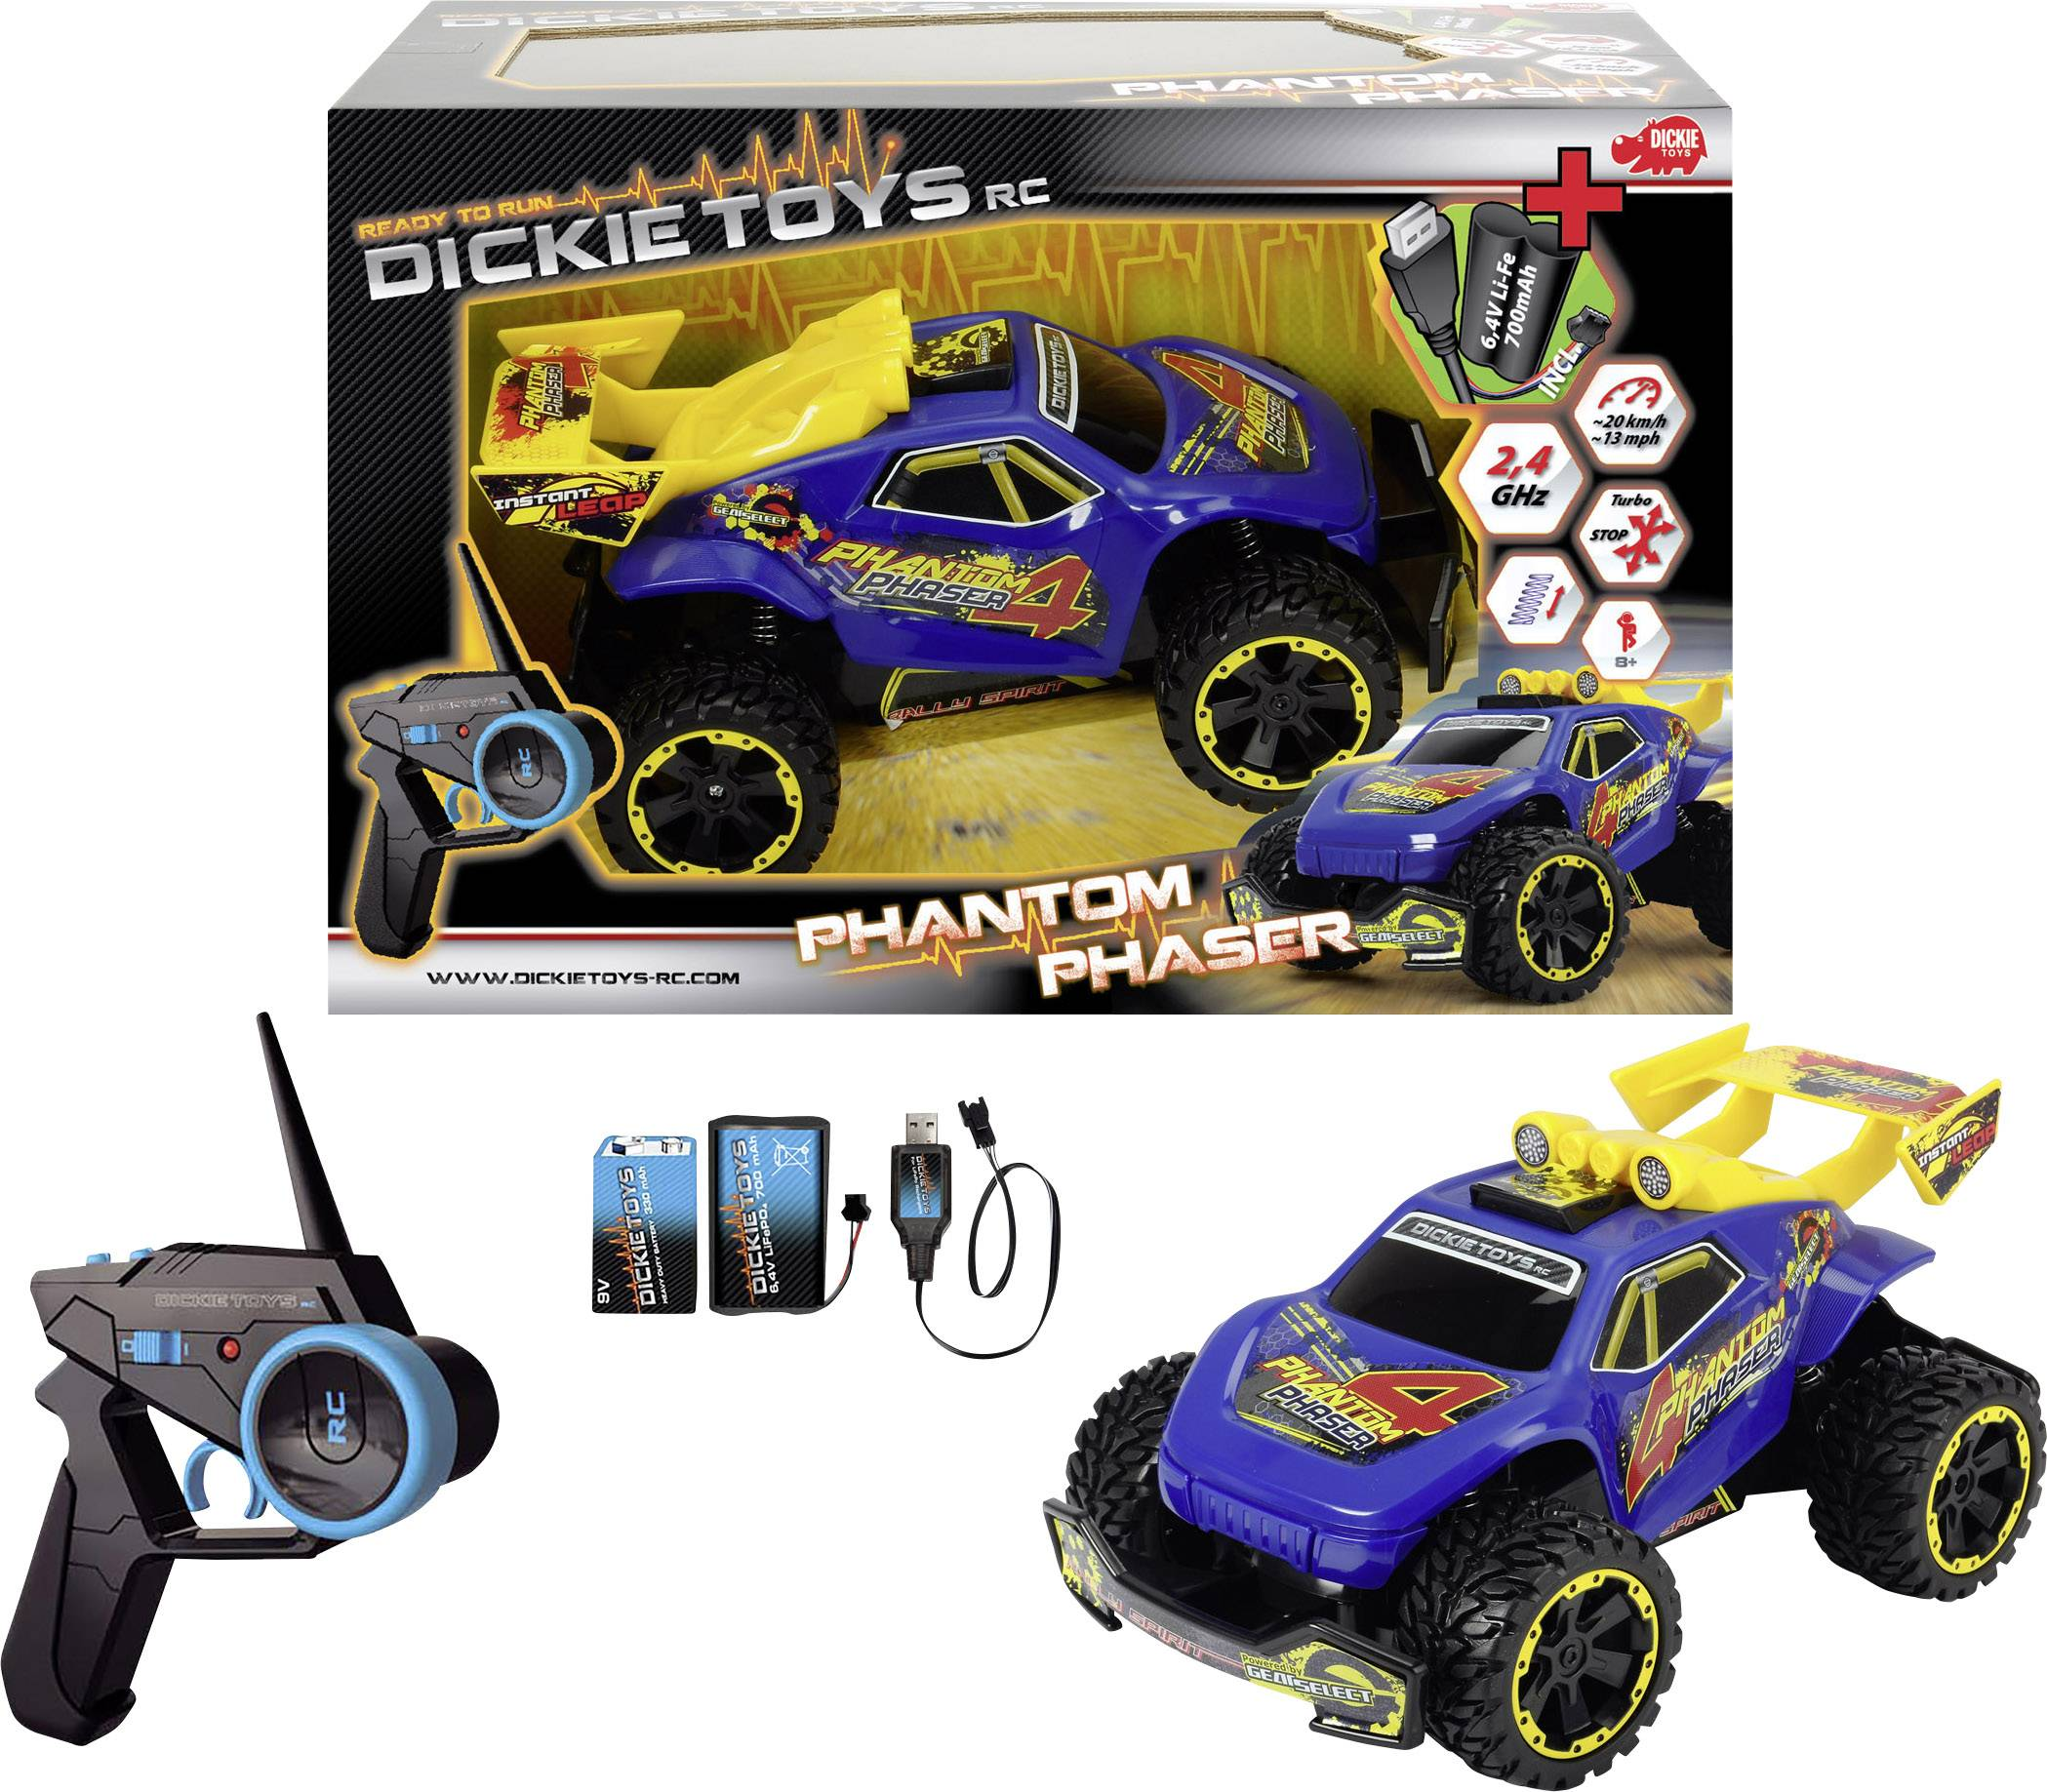 RC model auta buggy Dickie Toys Phantom Phaser 201119110, 1:16